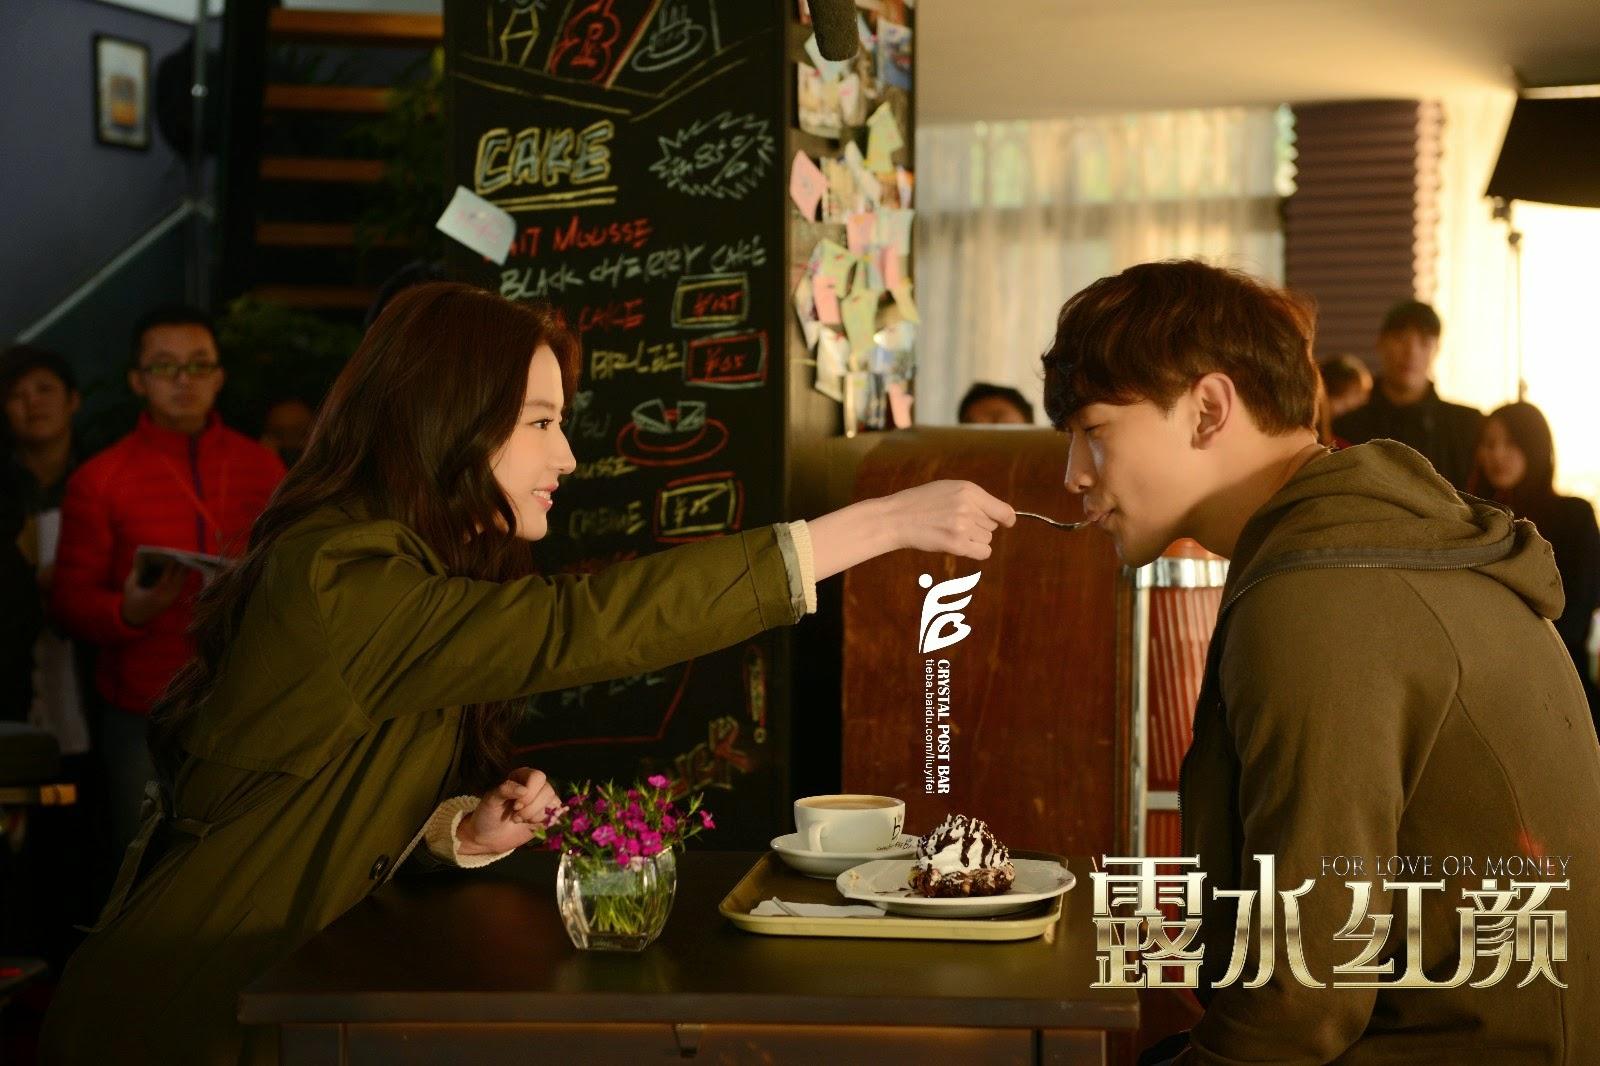 Rain 中国映画 露水紅顔_c0047605_8112656.jpg